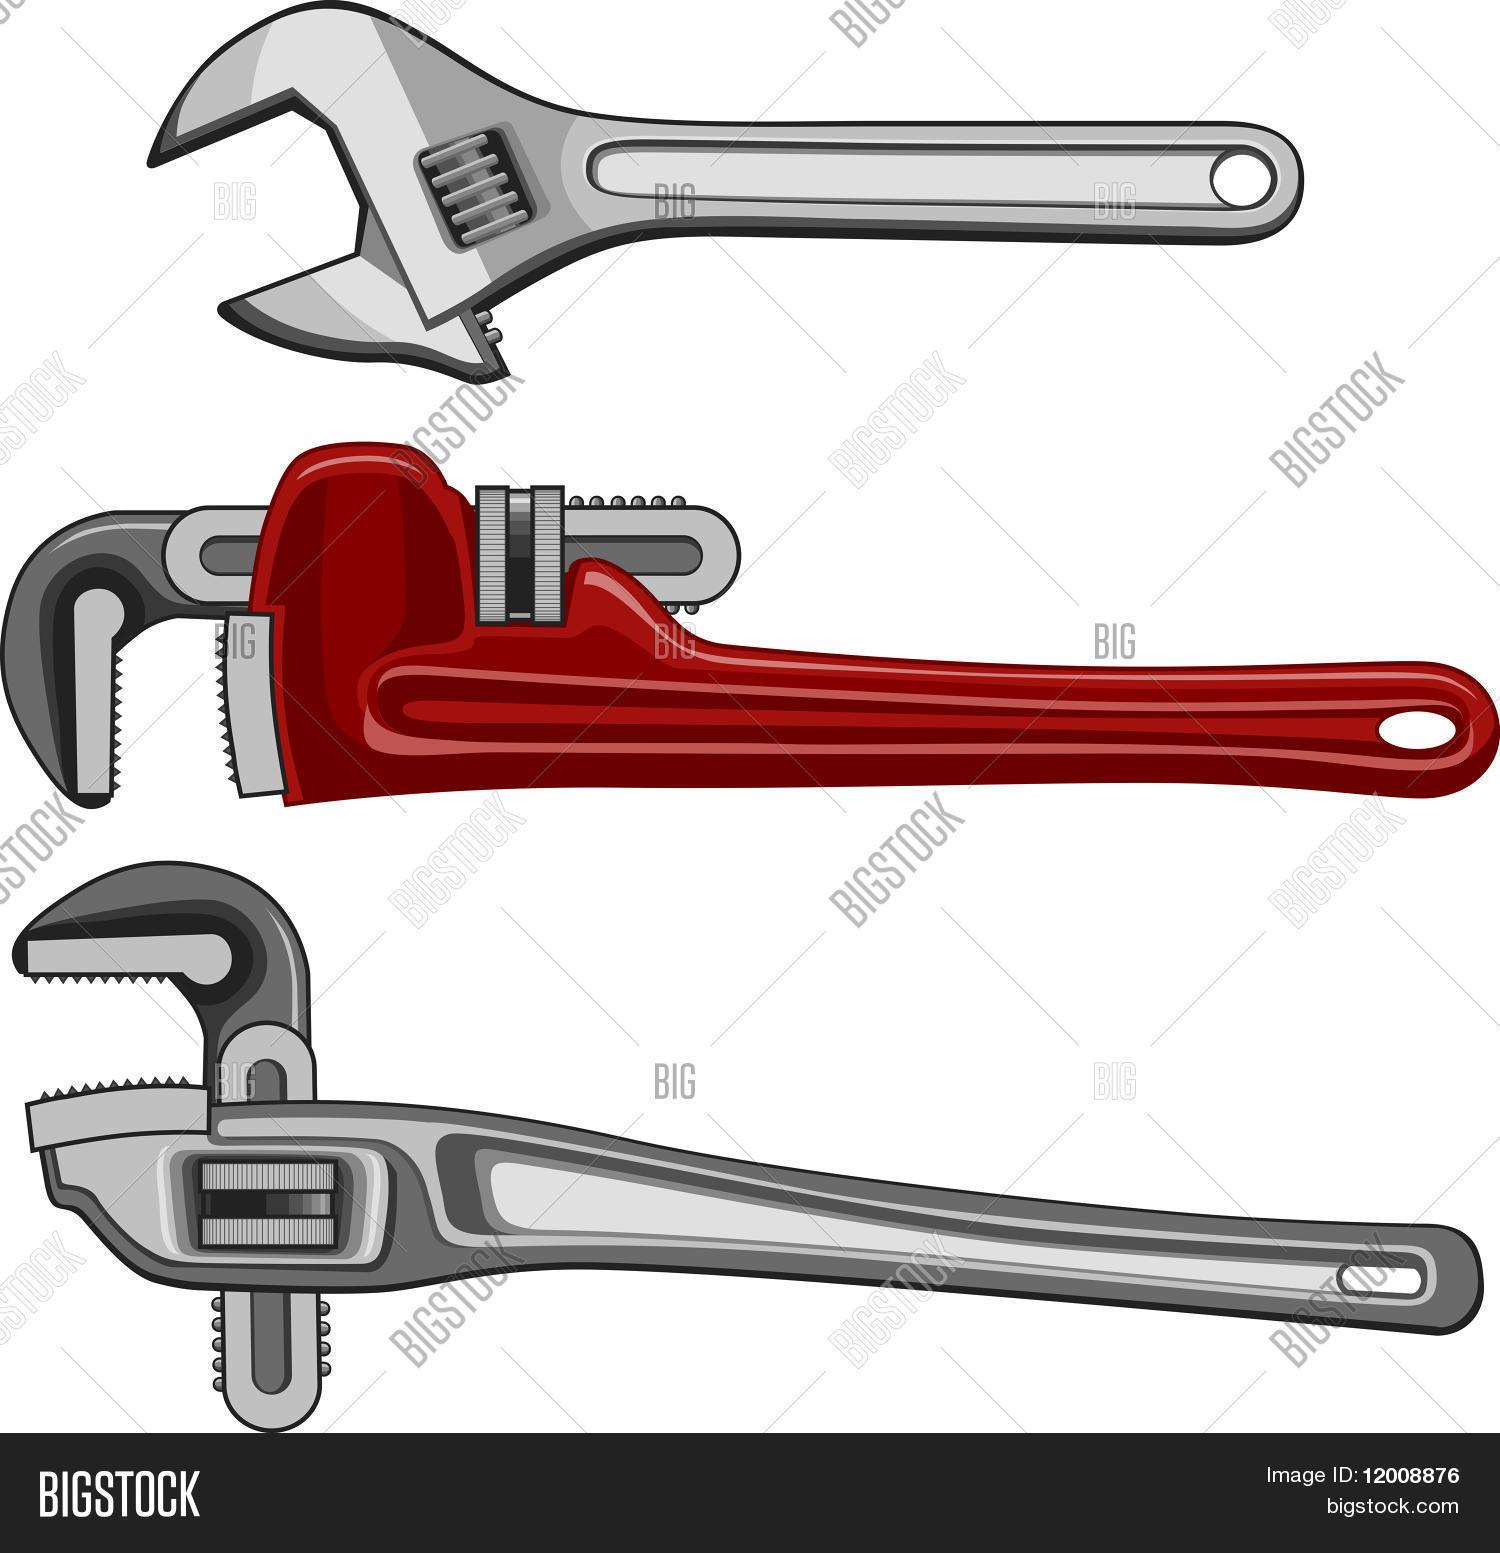 Adjustable Plumbing Pipe Wrenches Vector & Photo | Bigstock